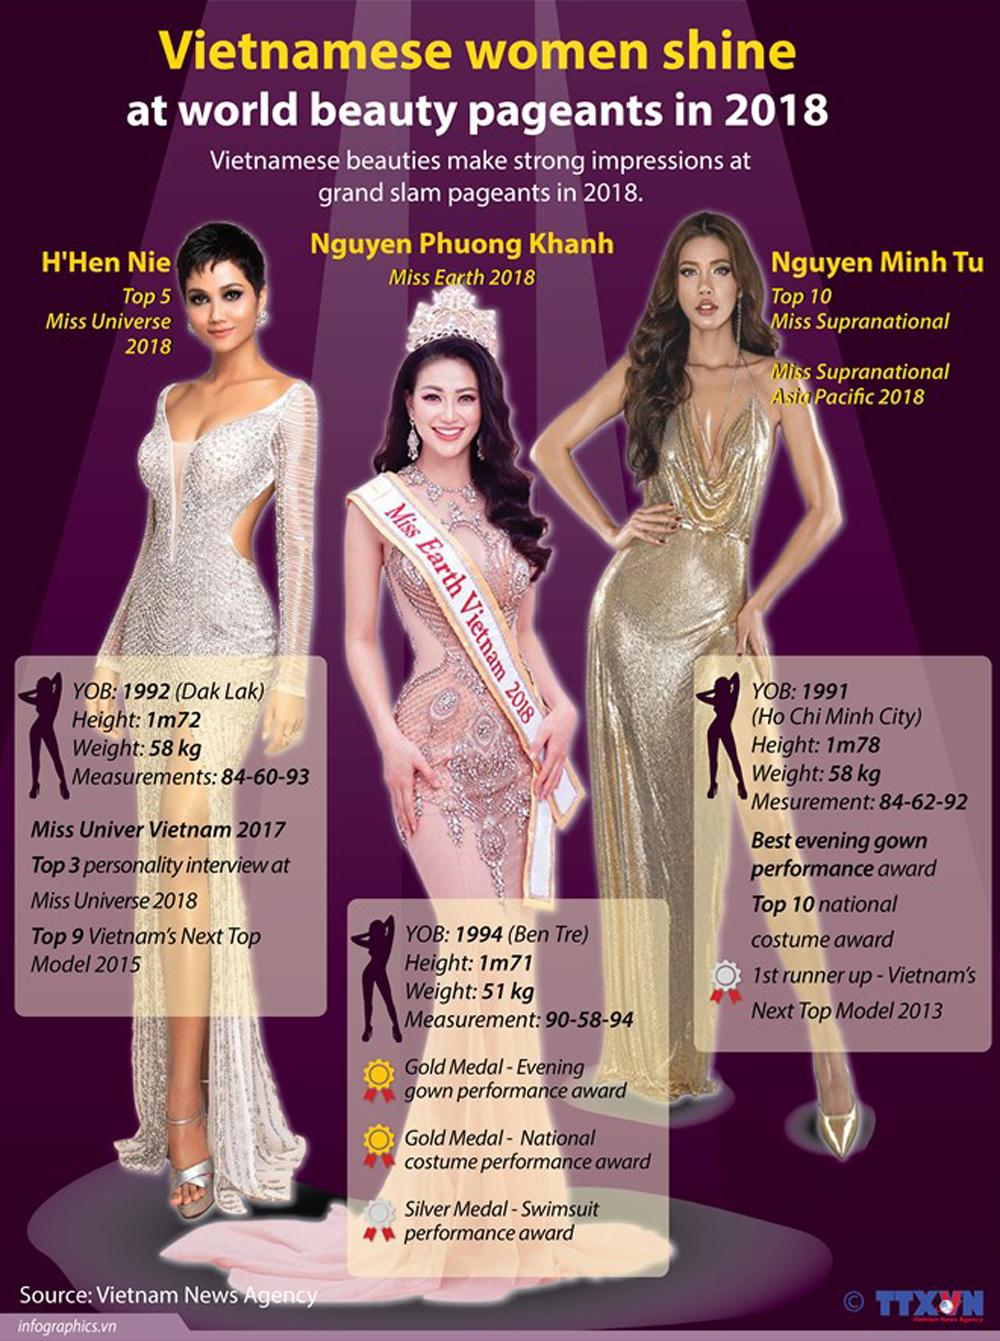 Vietnamese women, world beauty pageants, grand slam pageants, Miss Universe 2018, Miss Earth 2018, Miss Supranational 2018, H'Hen Nie, Nguyen Phuong Khanh, Nguyen Minh Tu